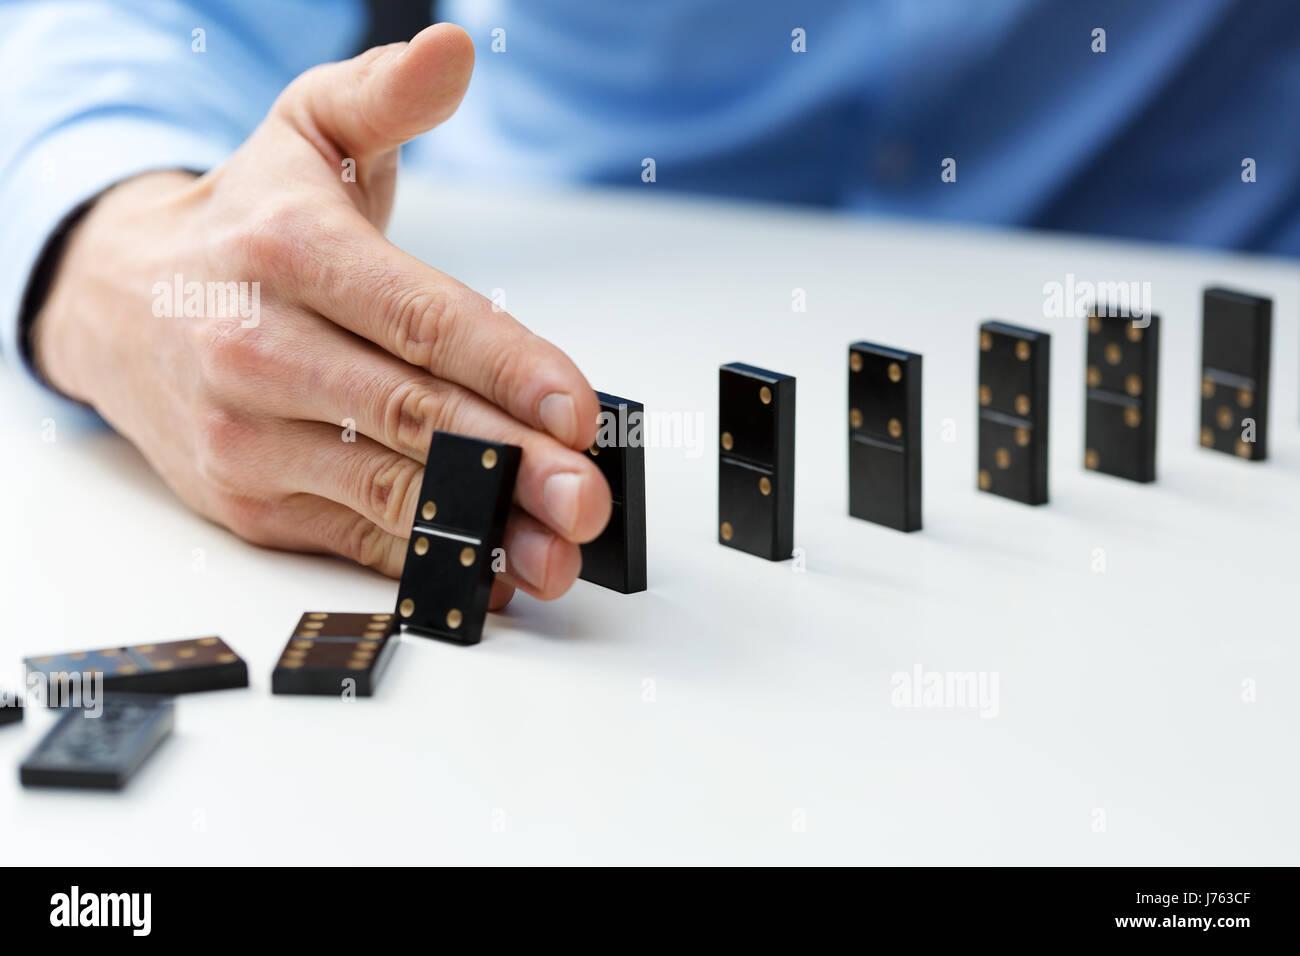 Empresario parar efecto dominó: concepto de resolución de problemas de negocios Imagen De Stock